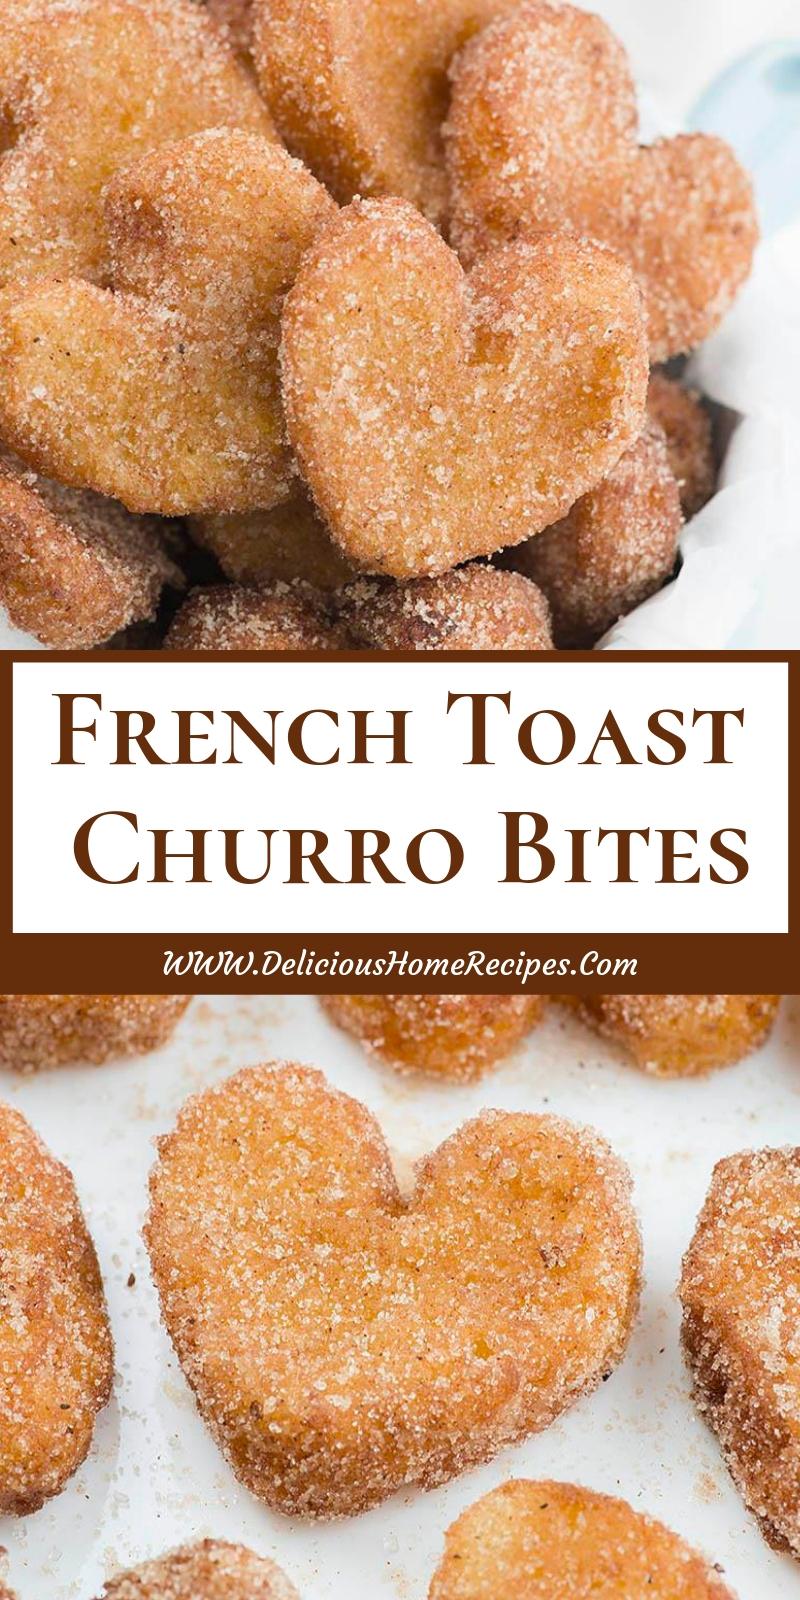 French Toast Churro Bites